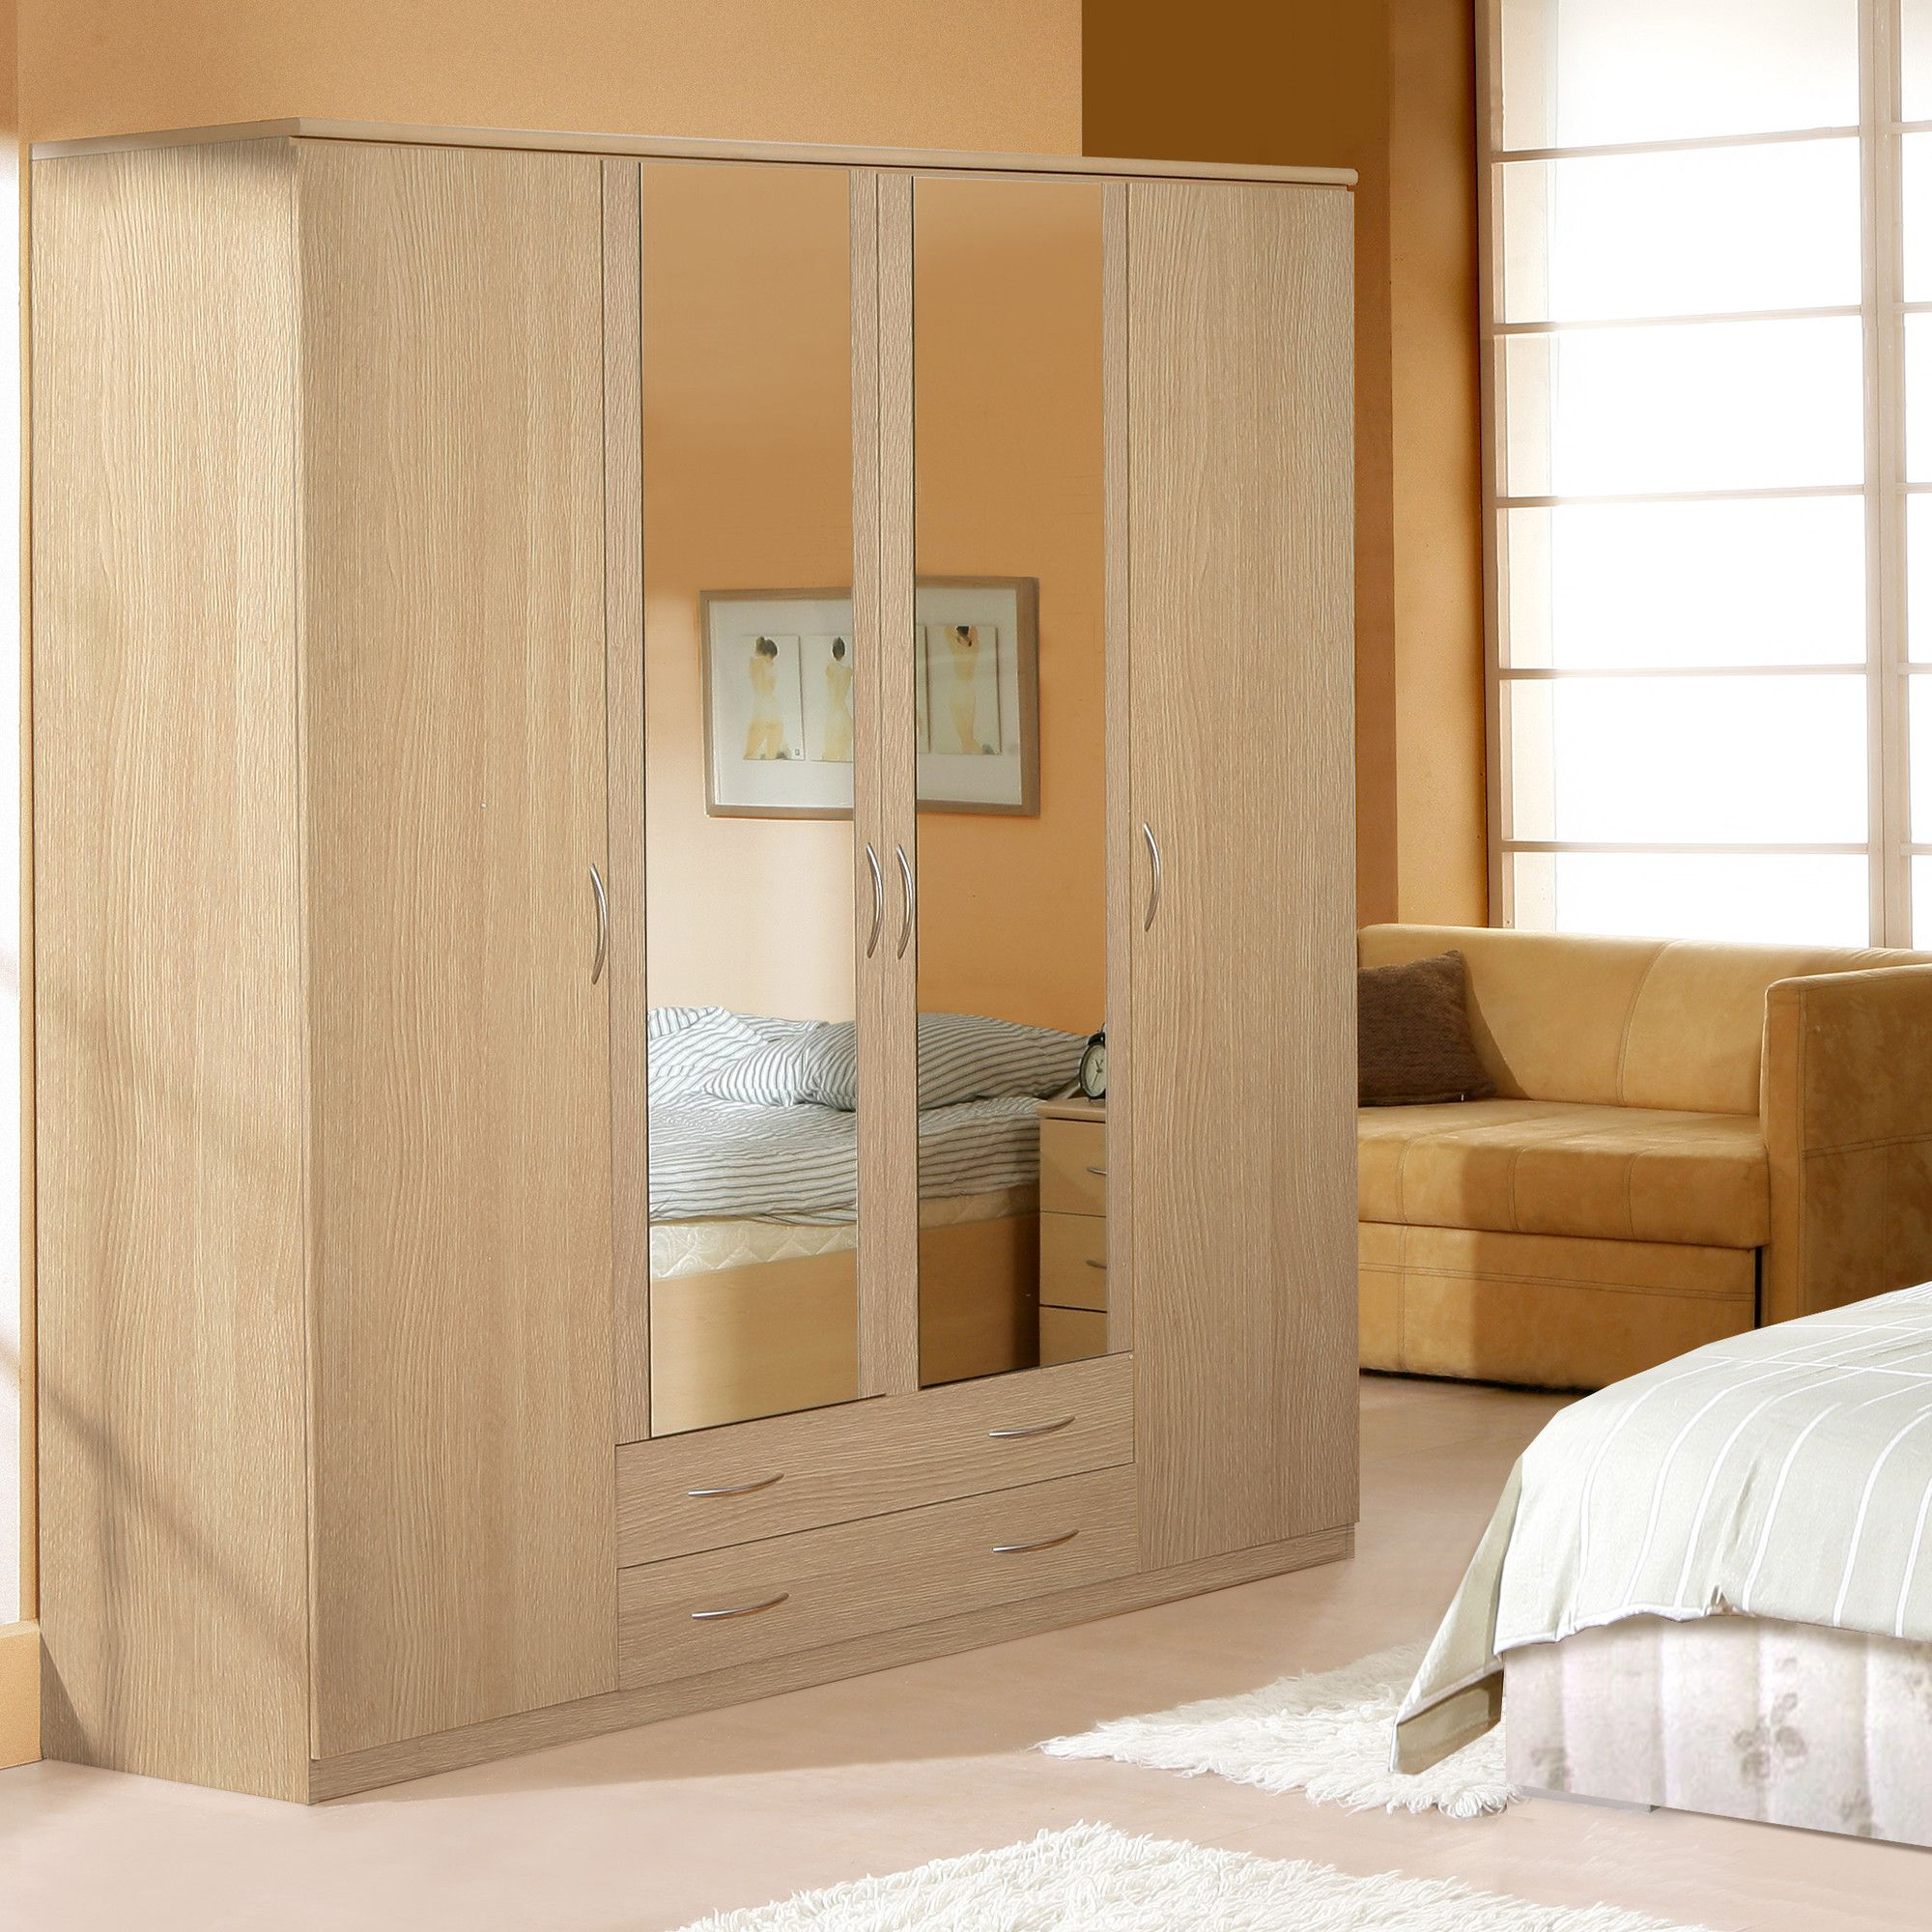 Ideal Furniture Onyx Four Door Wardrobe in Yorkshire Oak at Tesco Direct